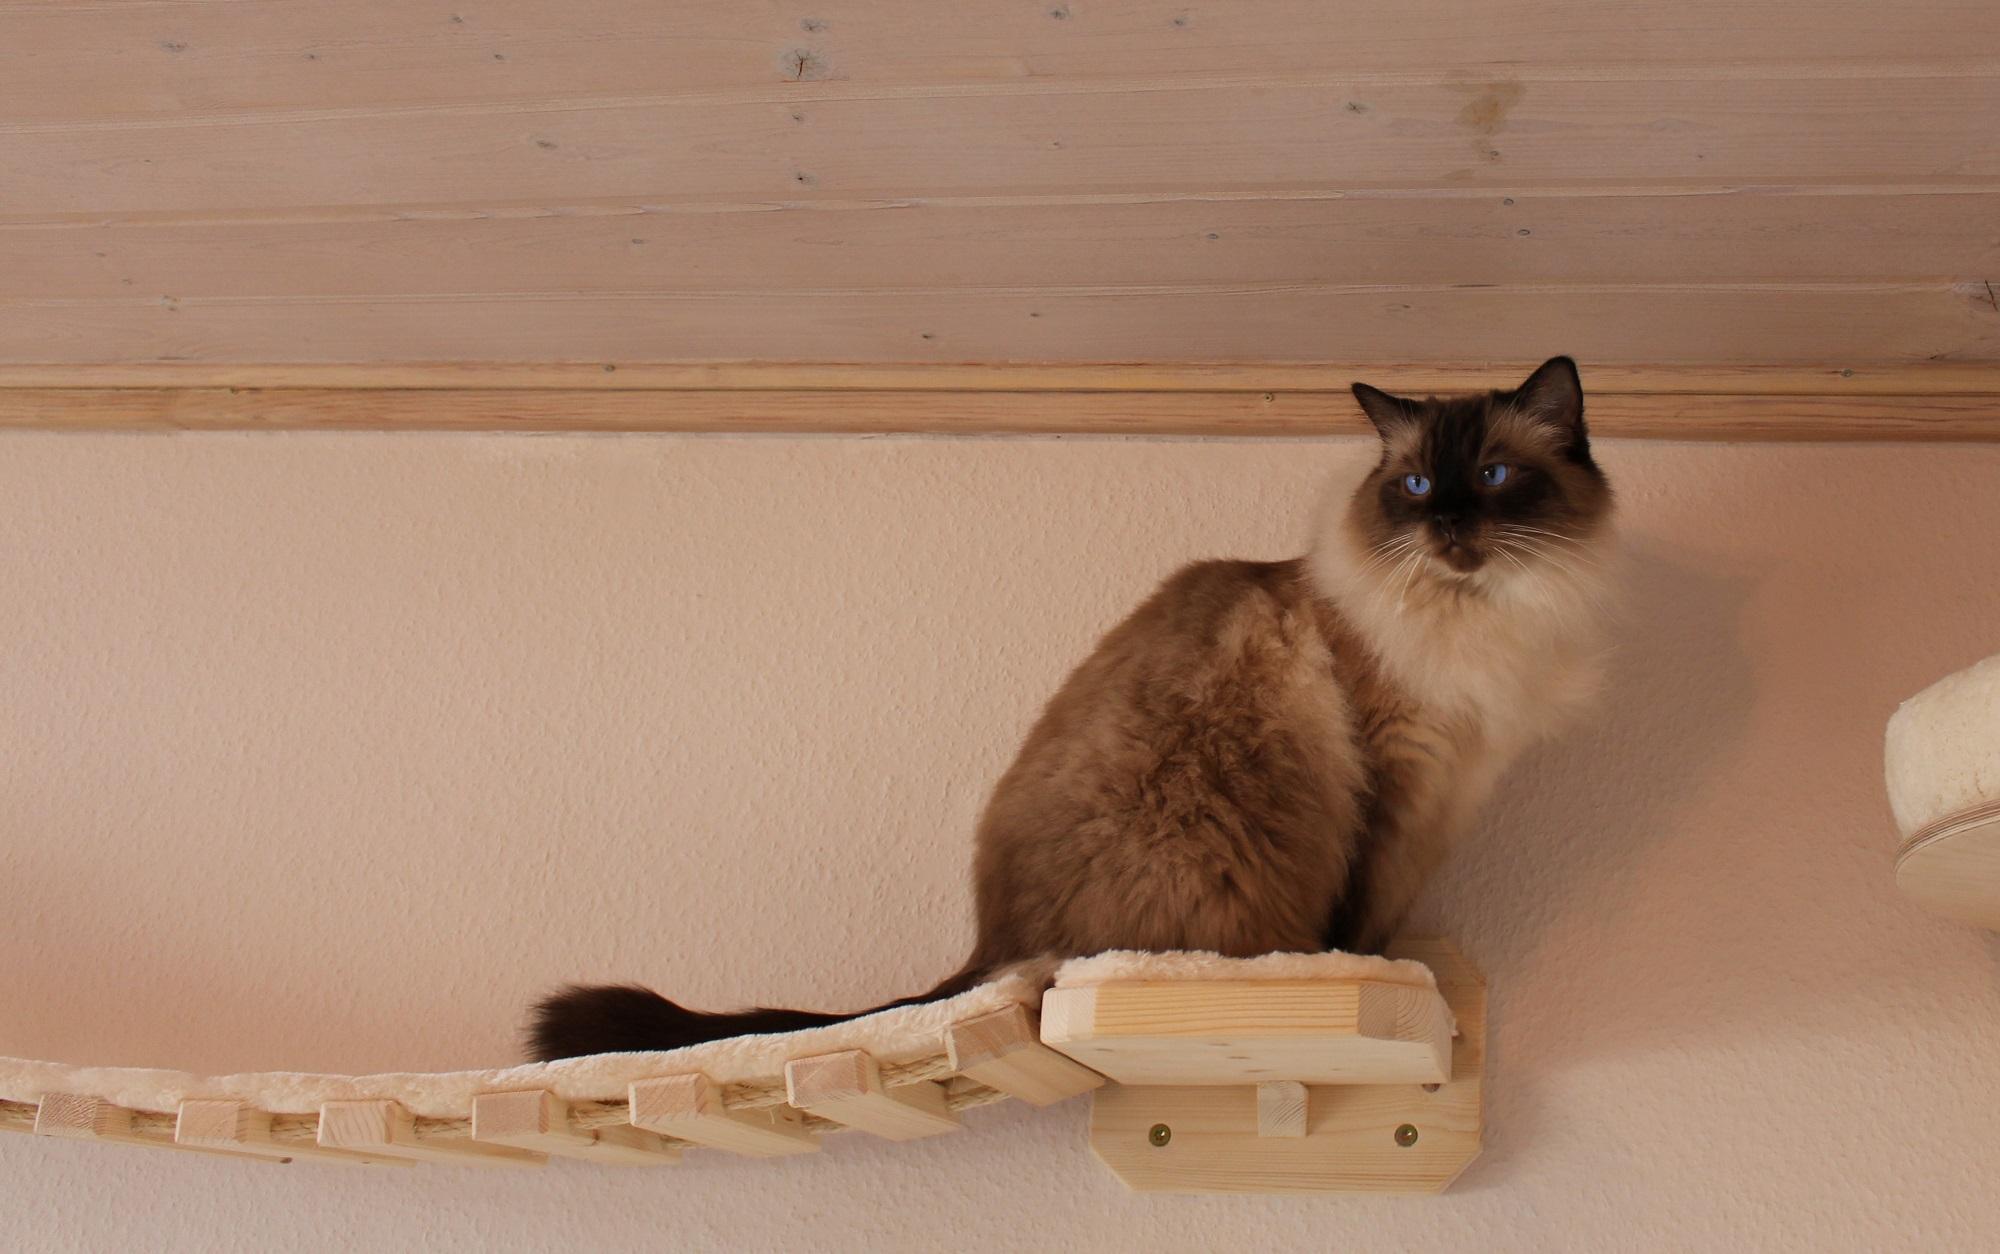 catwalk f r katzen h ngebr cke f r katzen liegemulde xxl. Black Bedroom Furniture Sets. Home Design Ideas